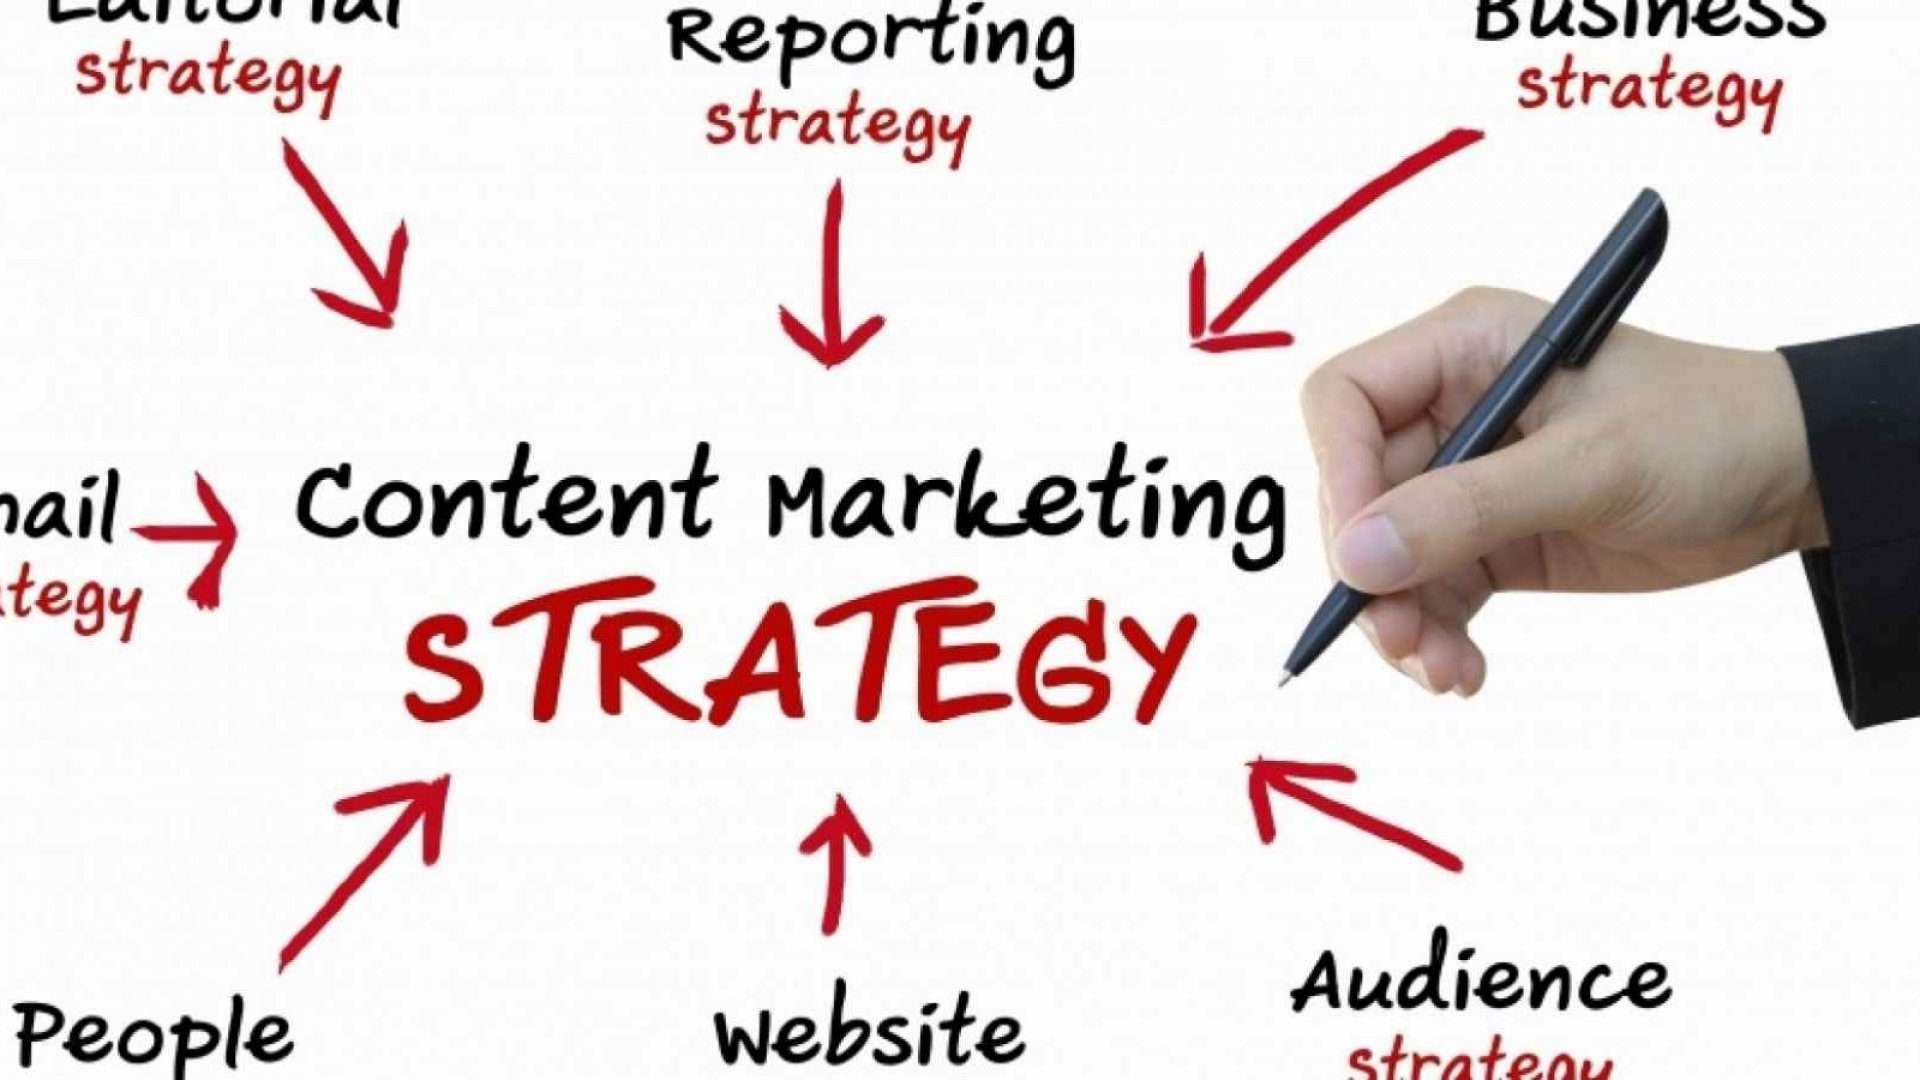 Contents Marketing